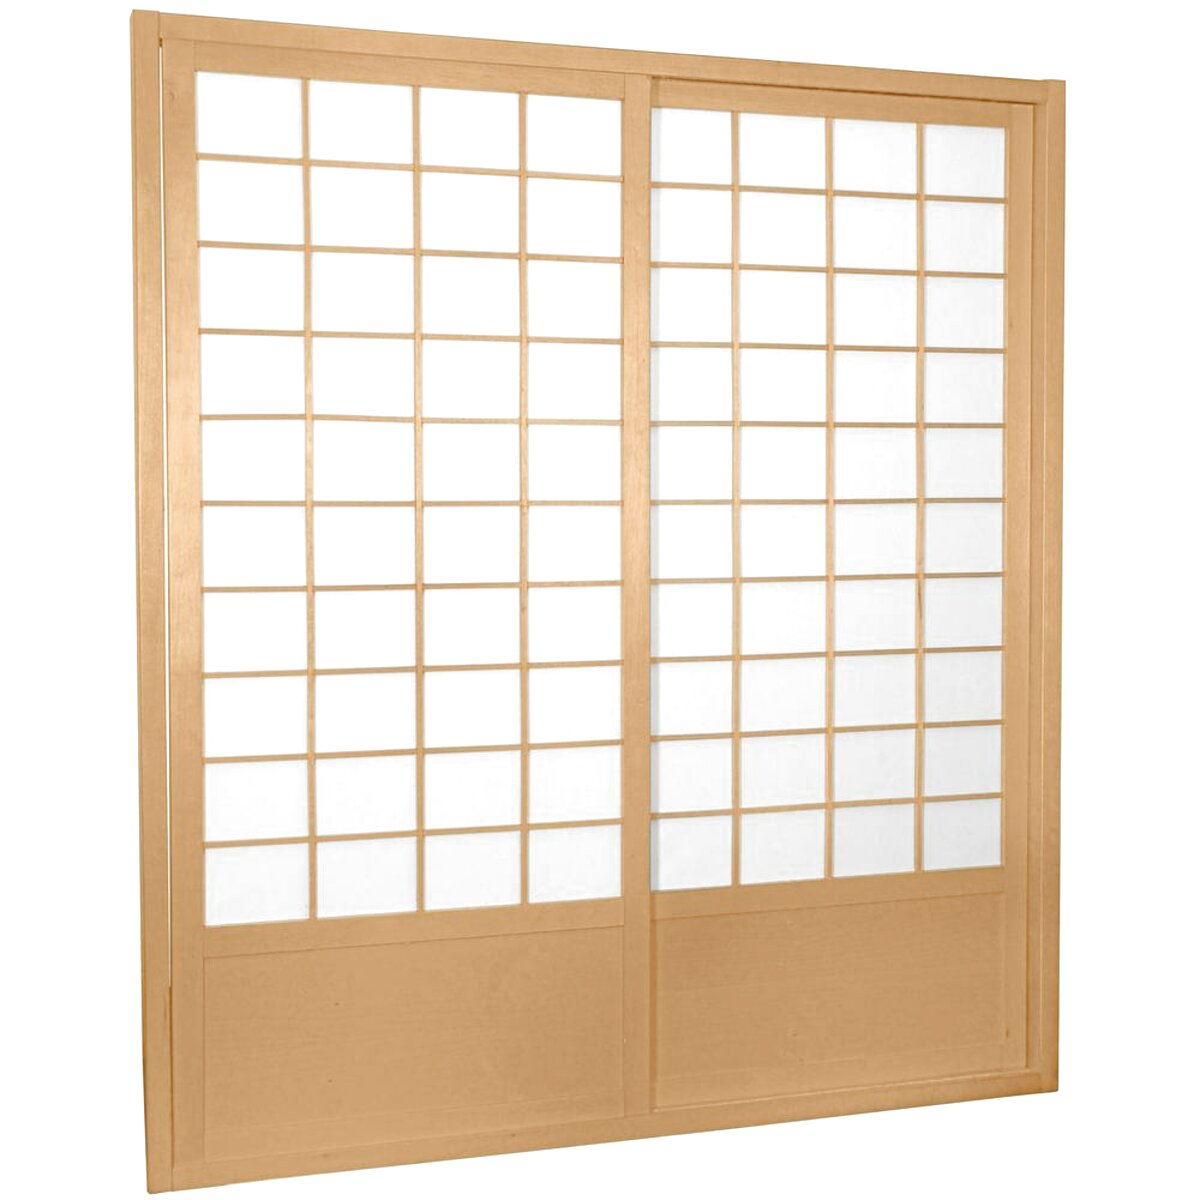 Japanese Sliding Doors For Sale Only 3 Left At 70